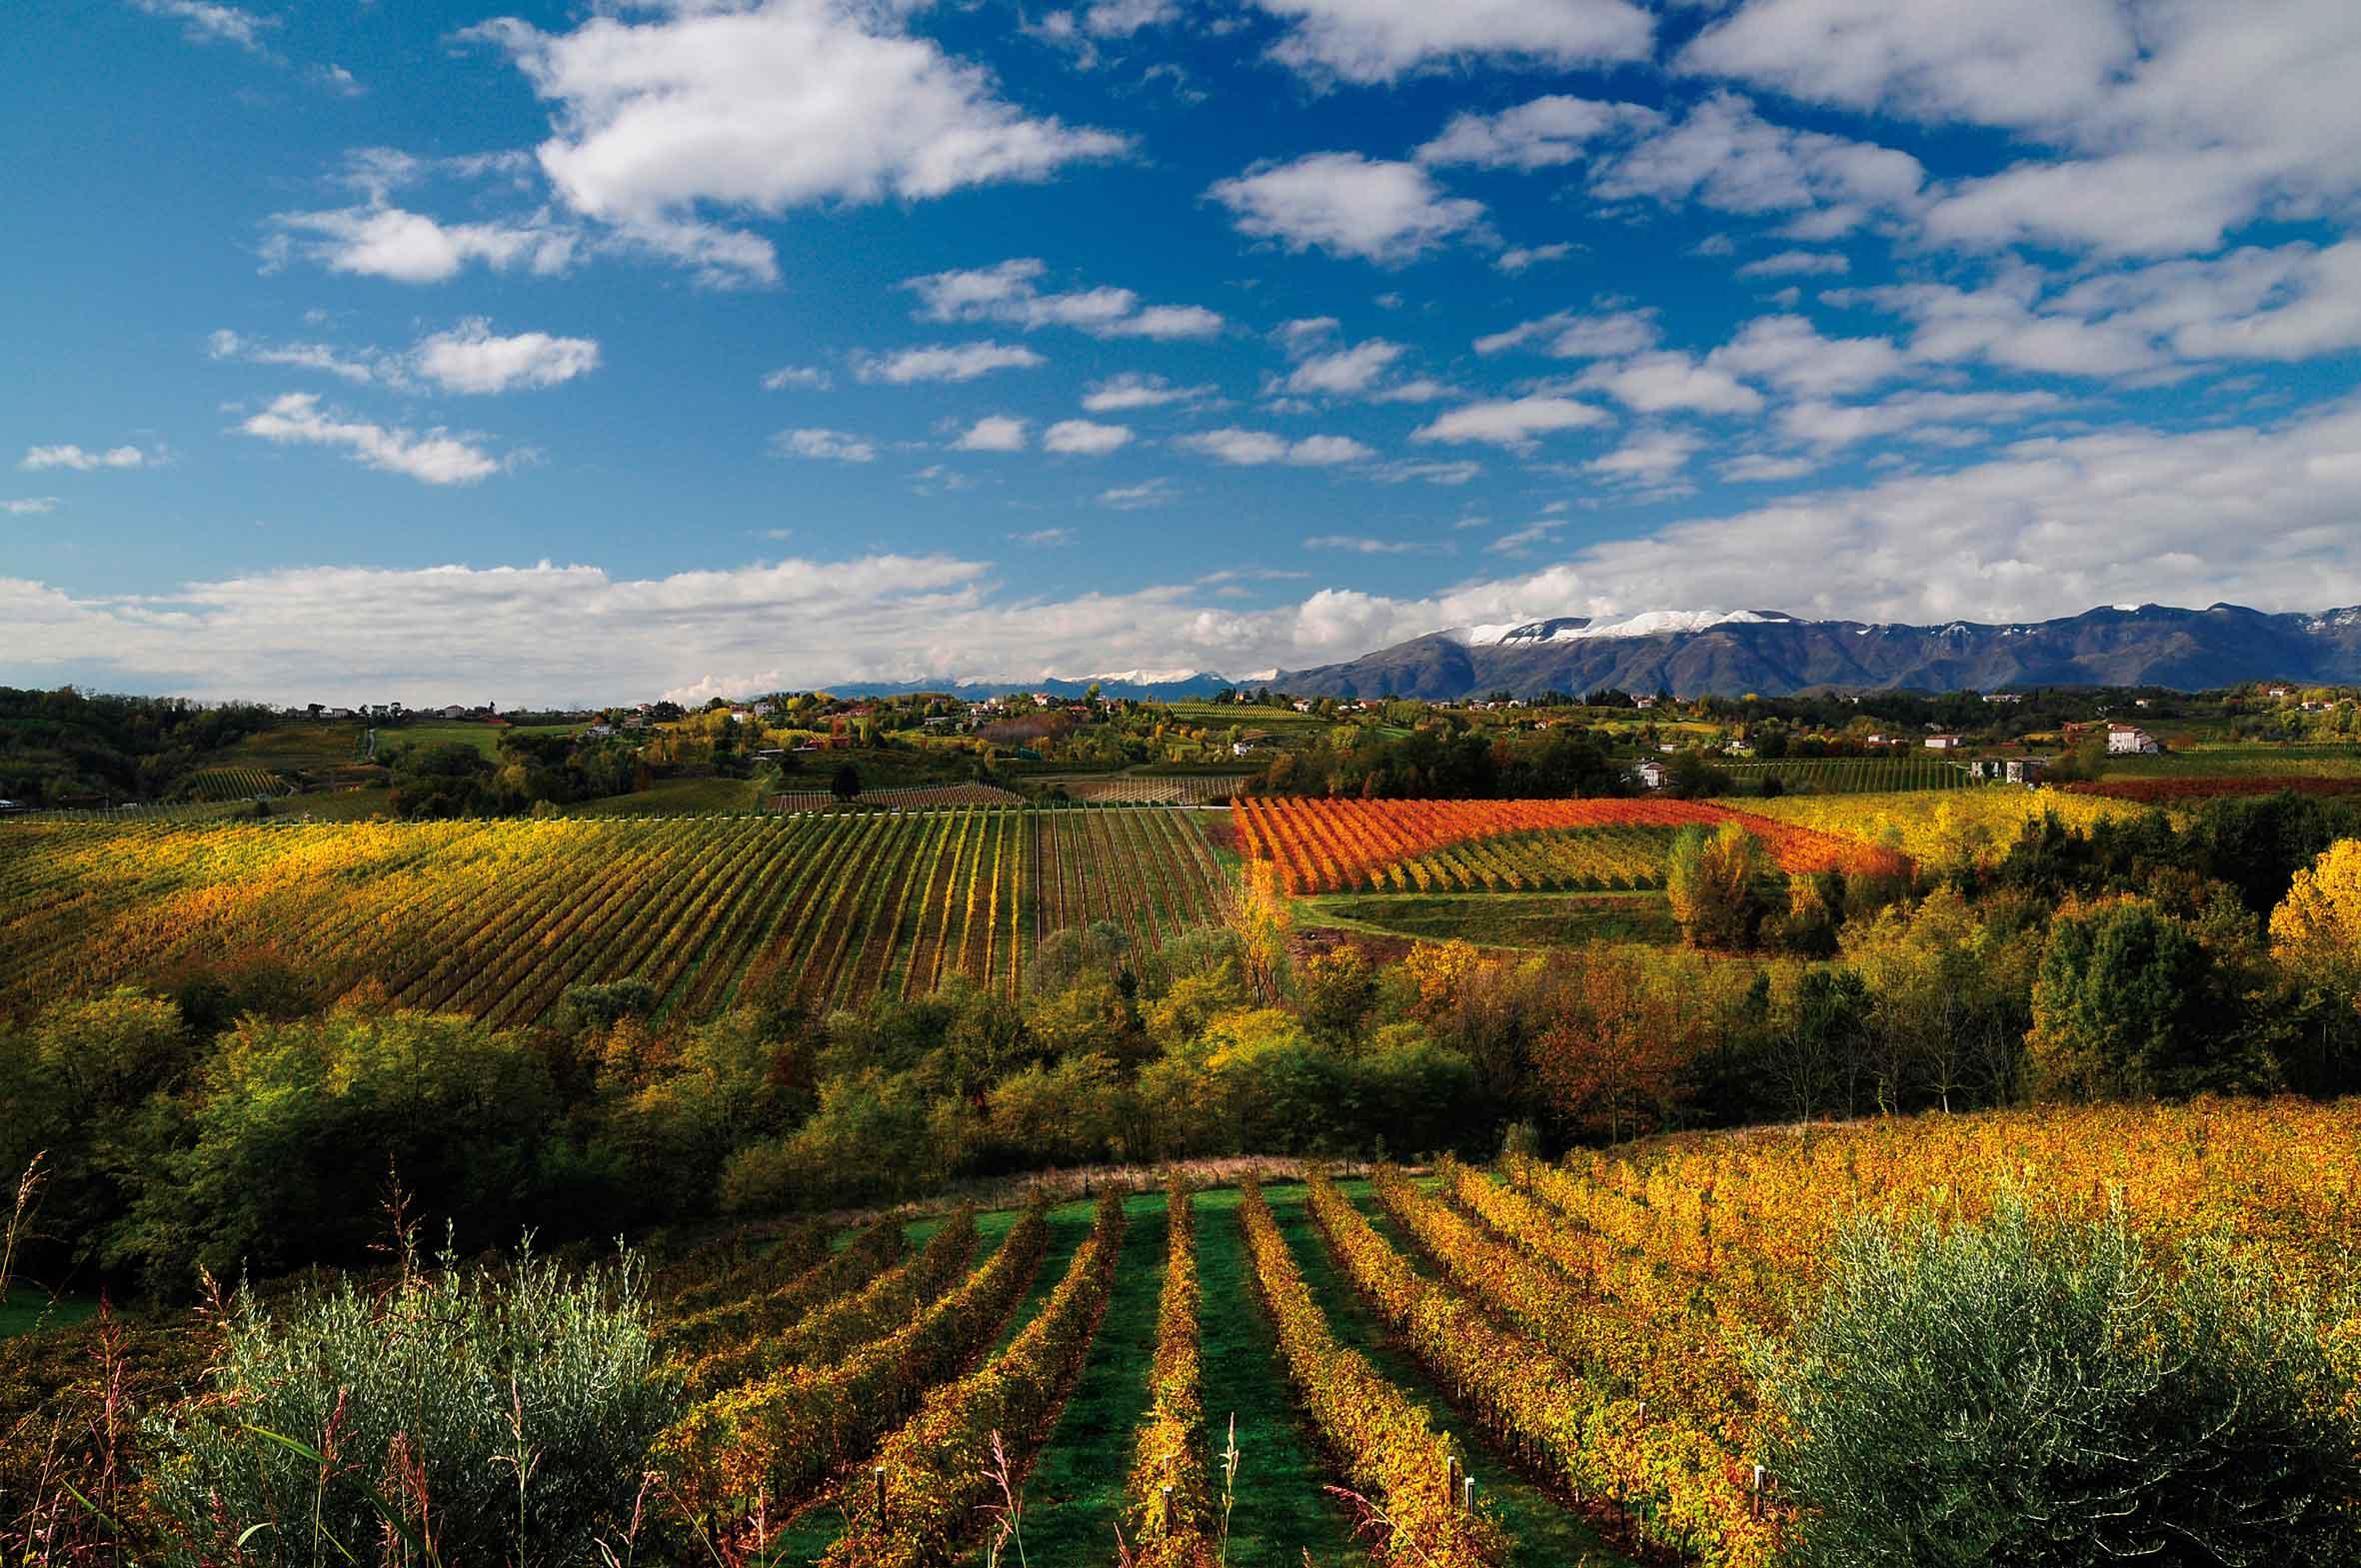 IMU terreni agricoli: cambiano le regole